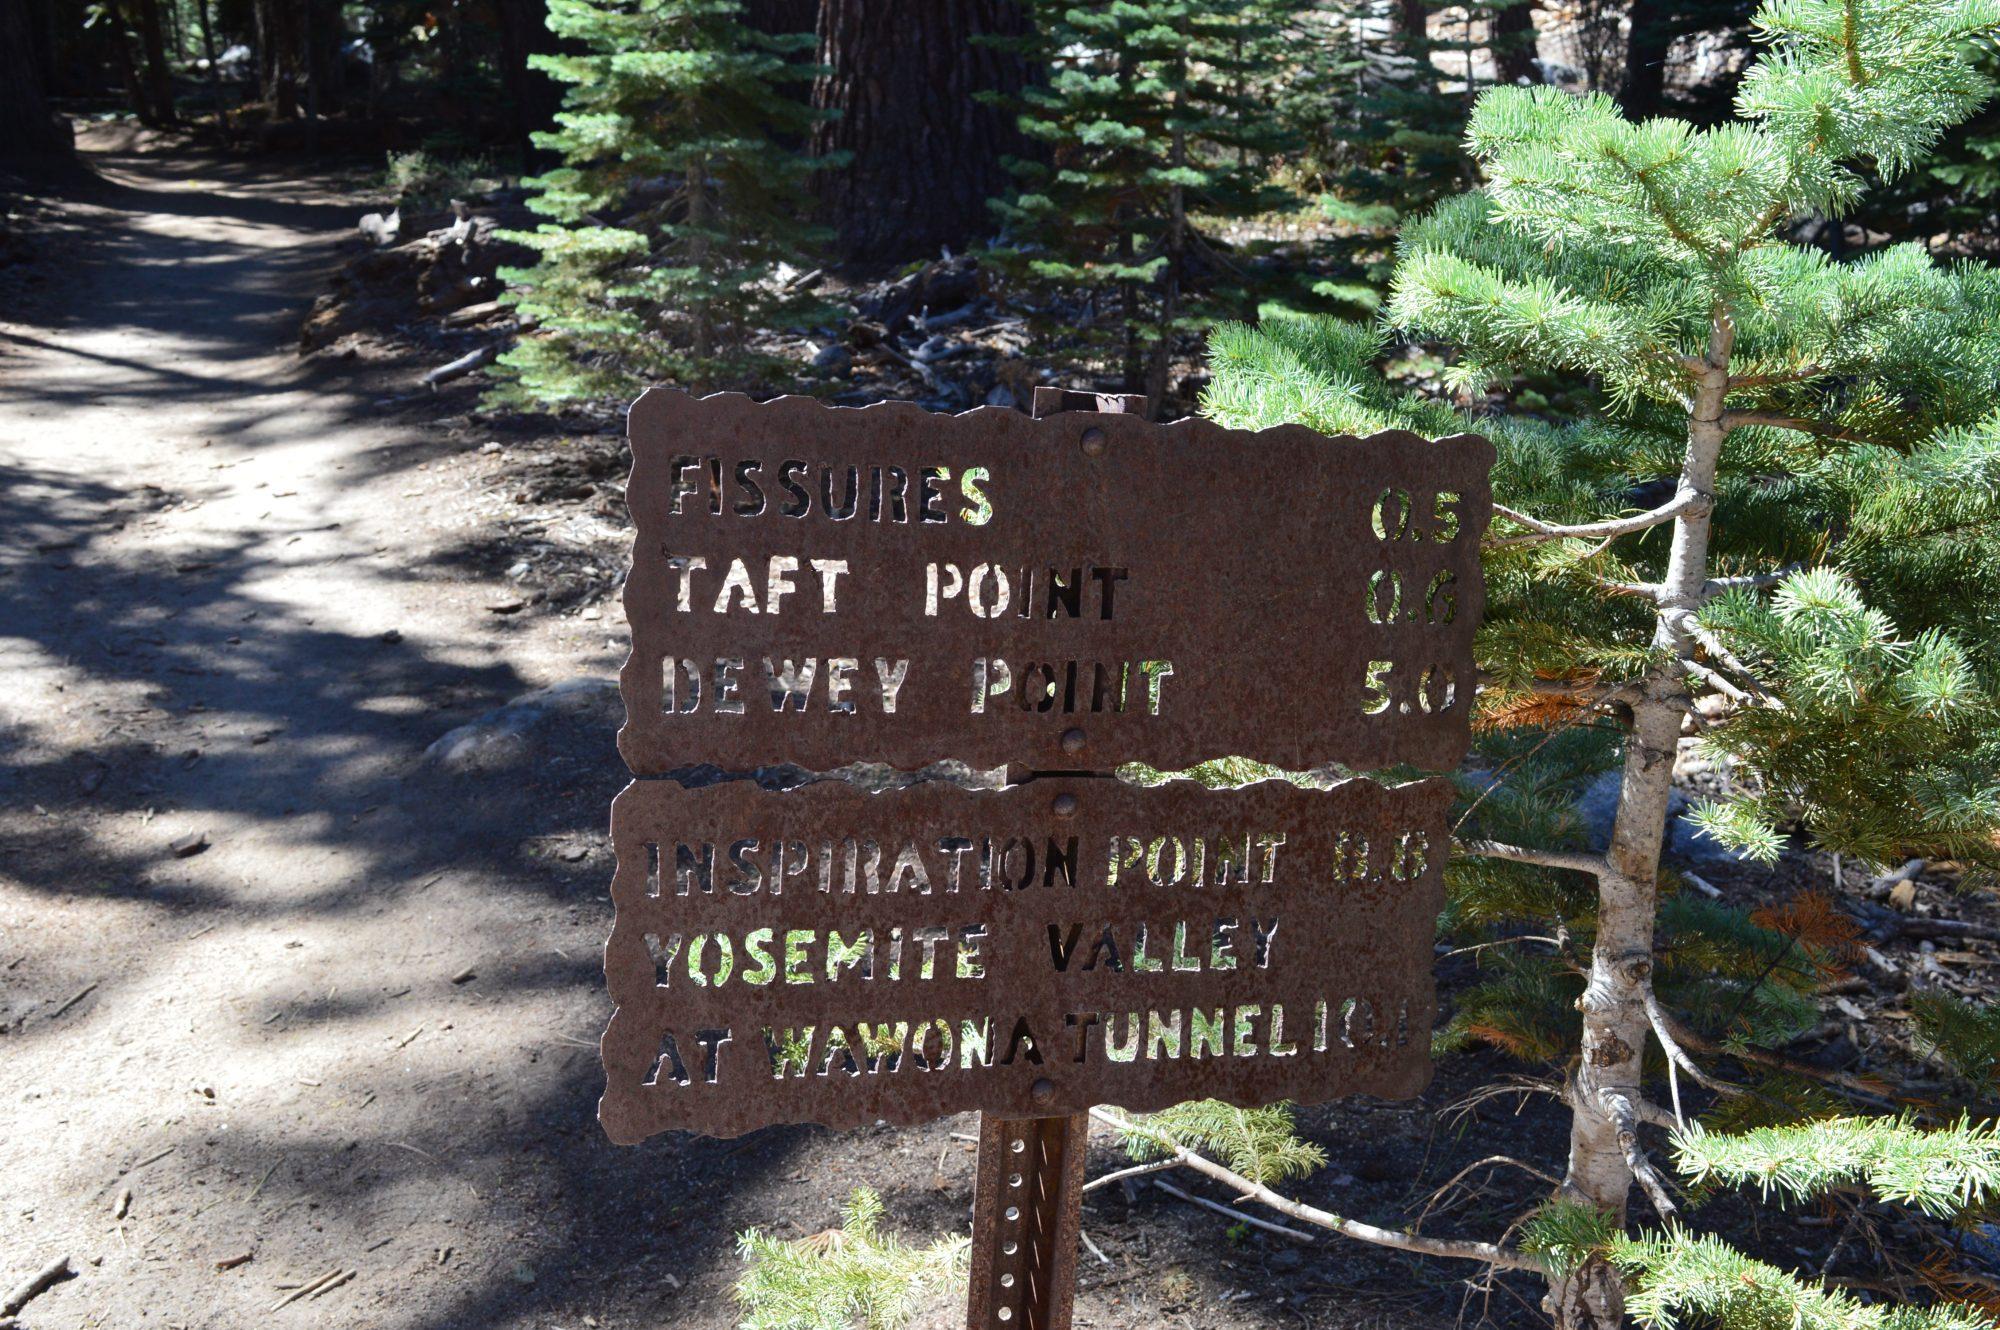 Taft Point Trail Yosemite National ParkTaft Point Trail Yosemite National Park